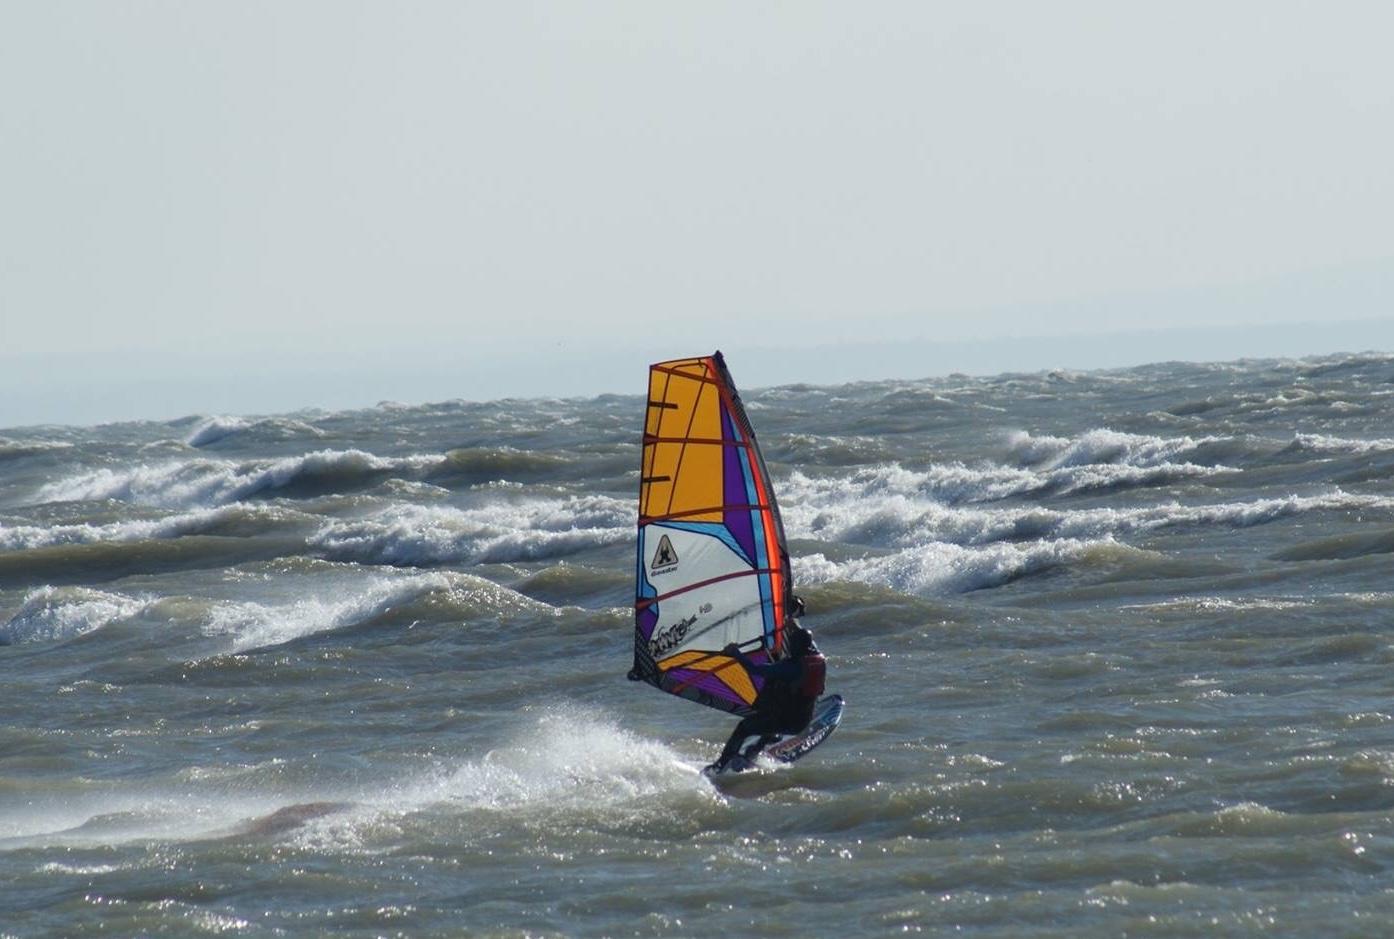 Windsurfing on Lake Erie.